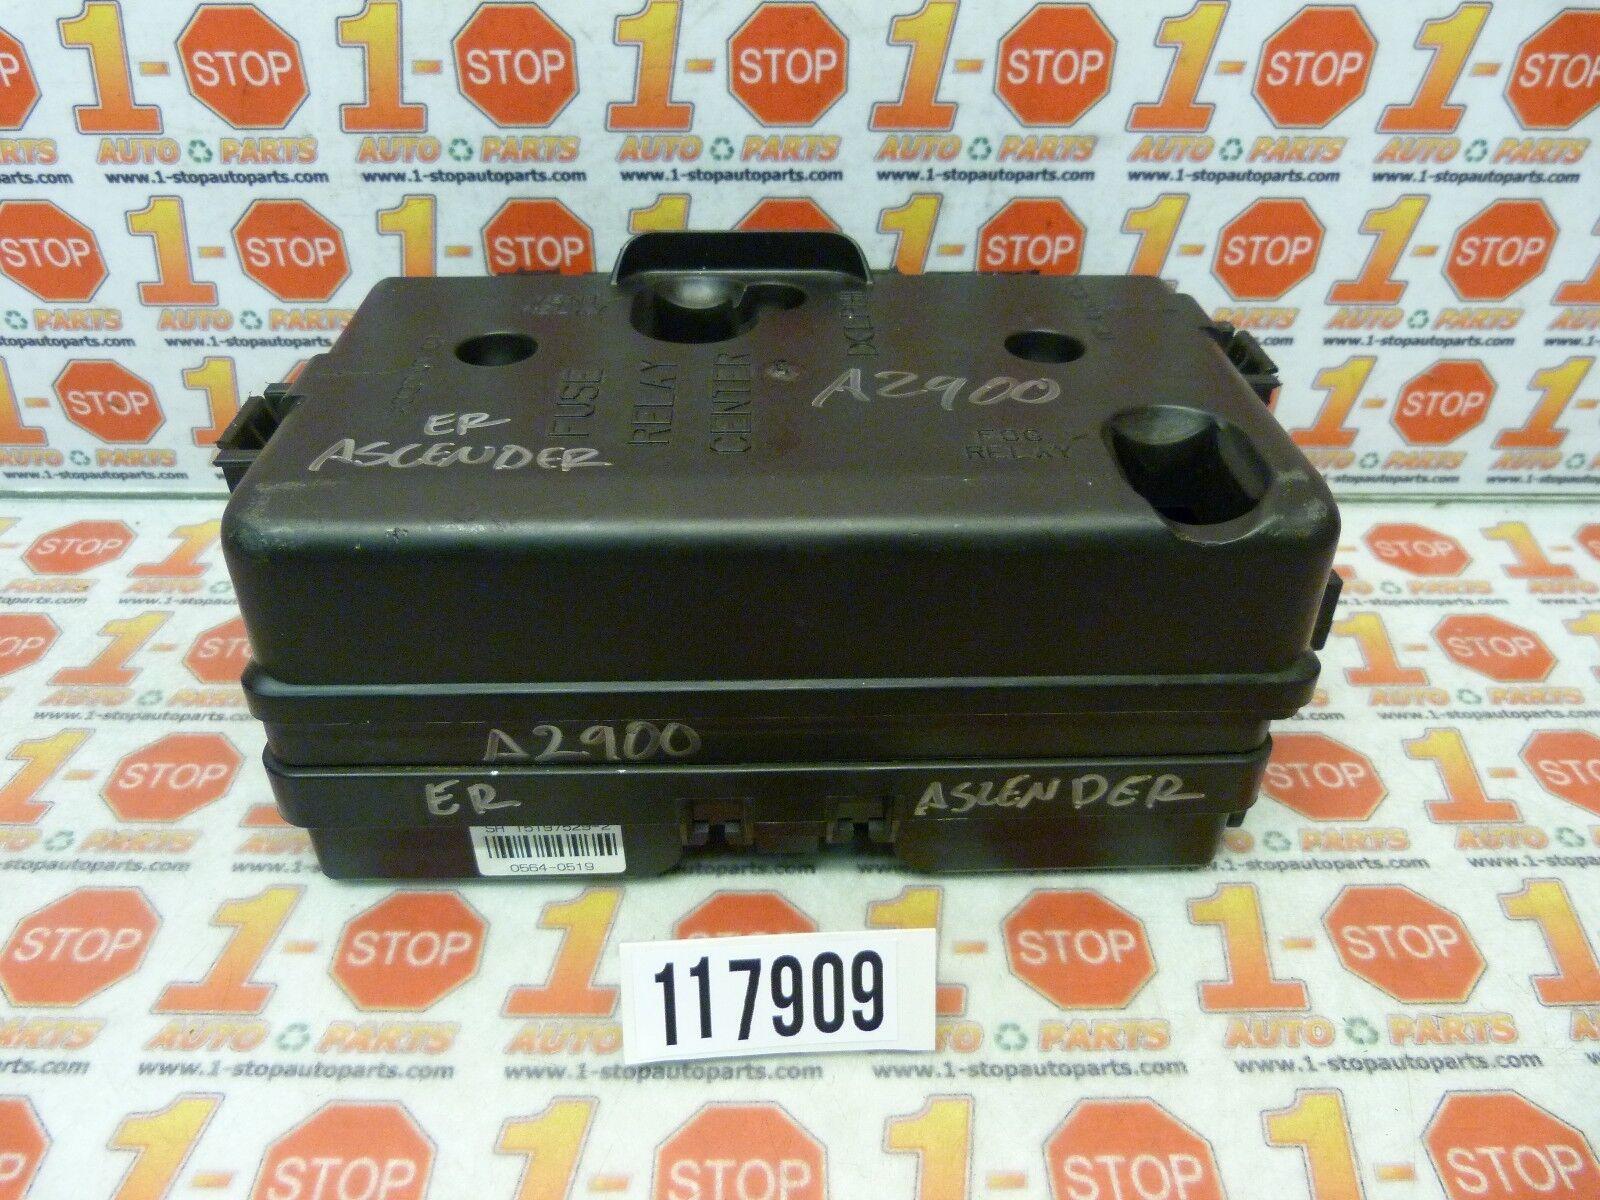 40 40 40 40 40 CHEVROLET EQUINOX ENGINE FUSE RELAY BOX ...